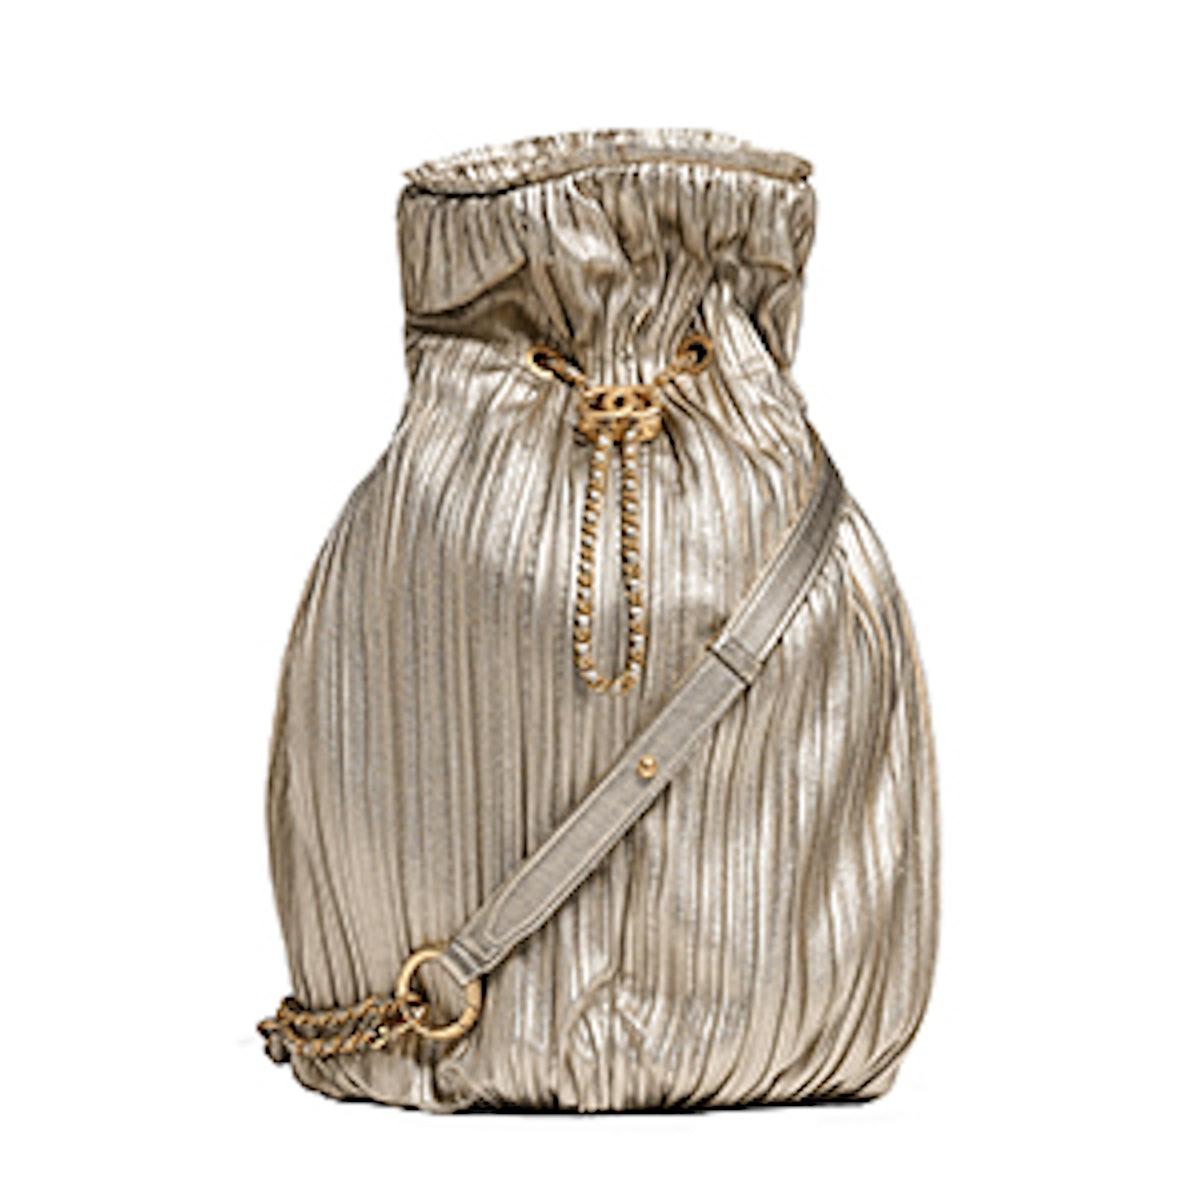 Pleated Iridescent Crumpled Calfskin & Gold-Tone Metal Backpack in Bronze